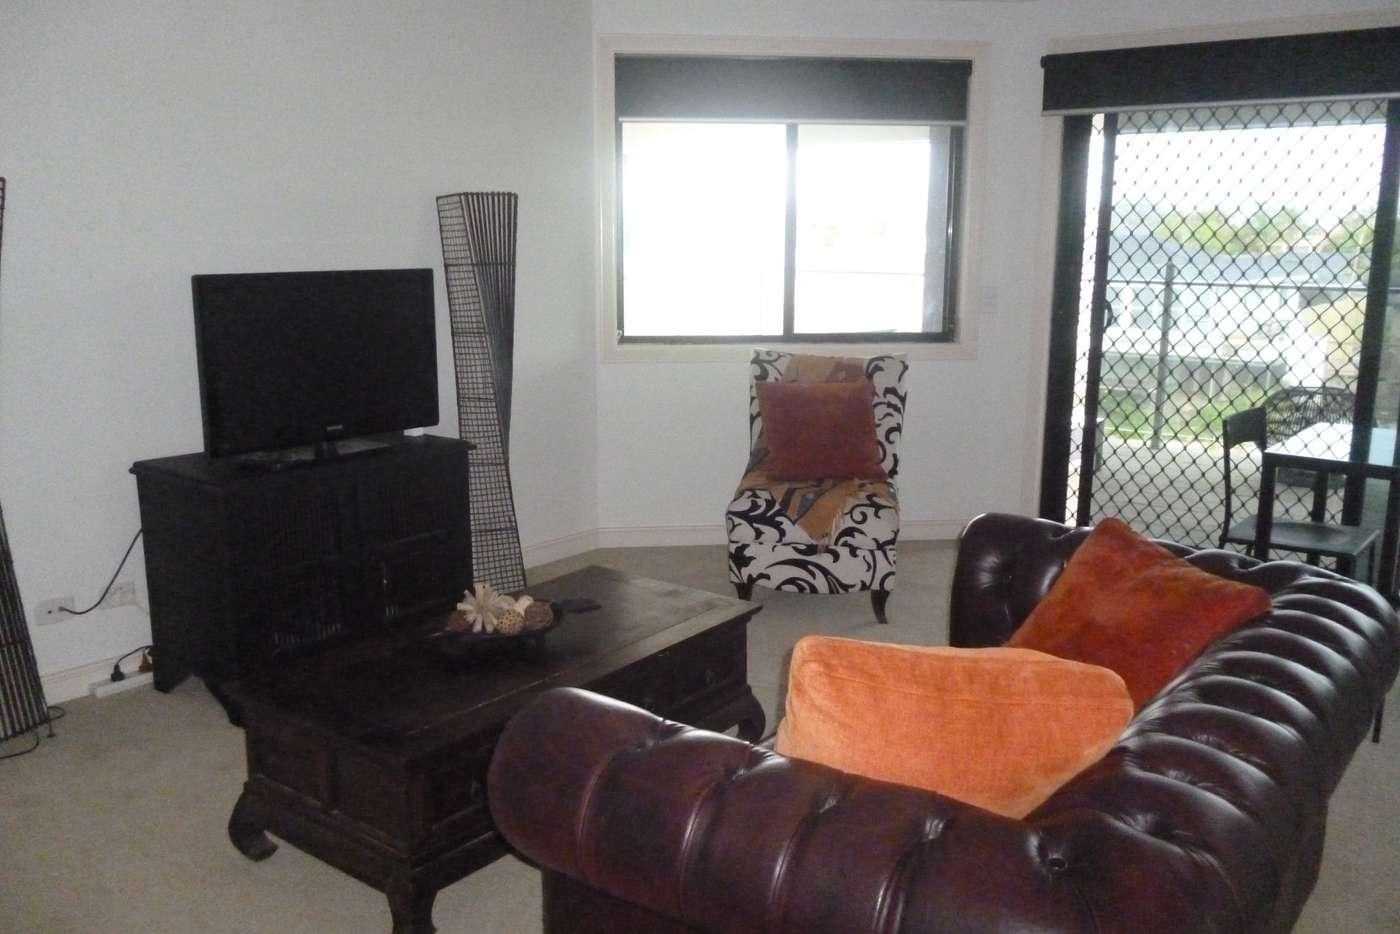 Seventh view of Homely unit listing, 3 Sarasota Key, Broadbeach Waters QLD 4218